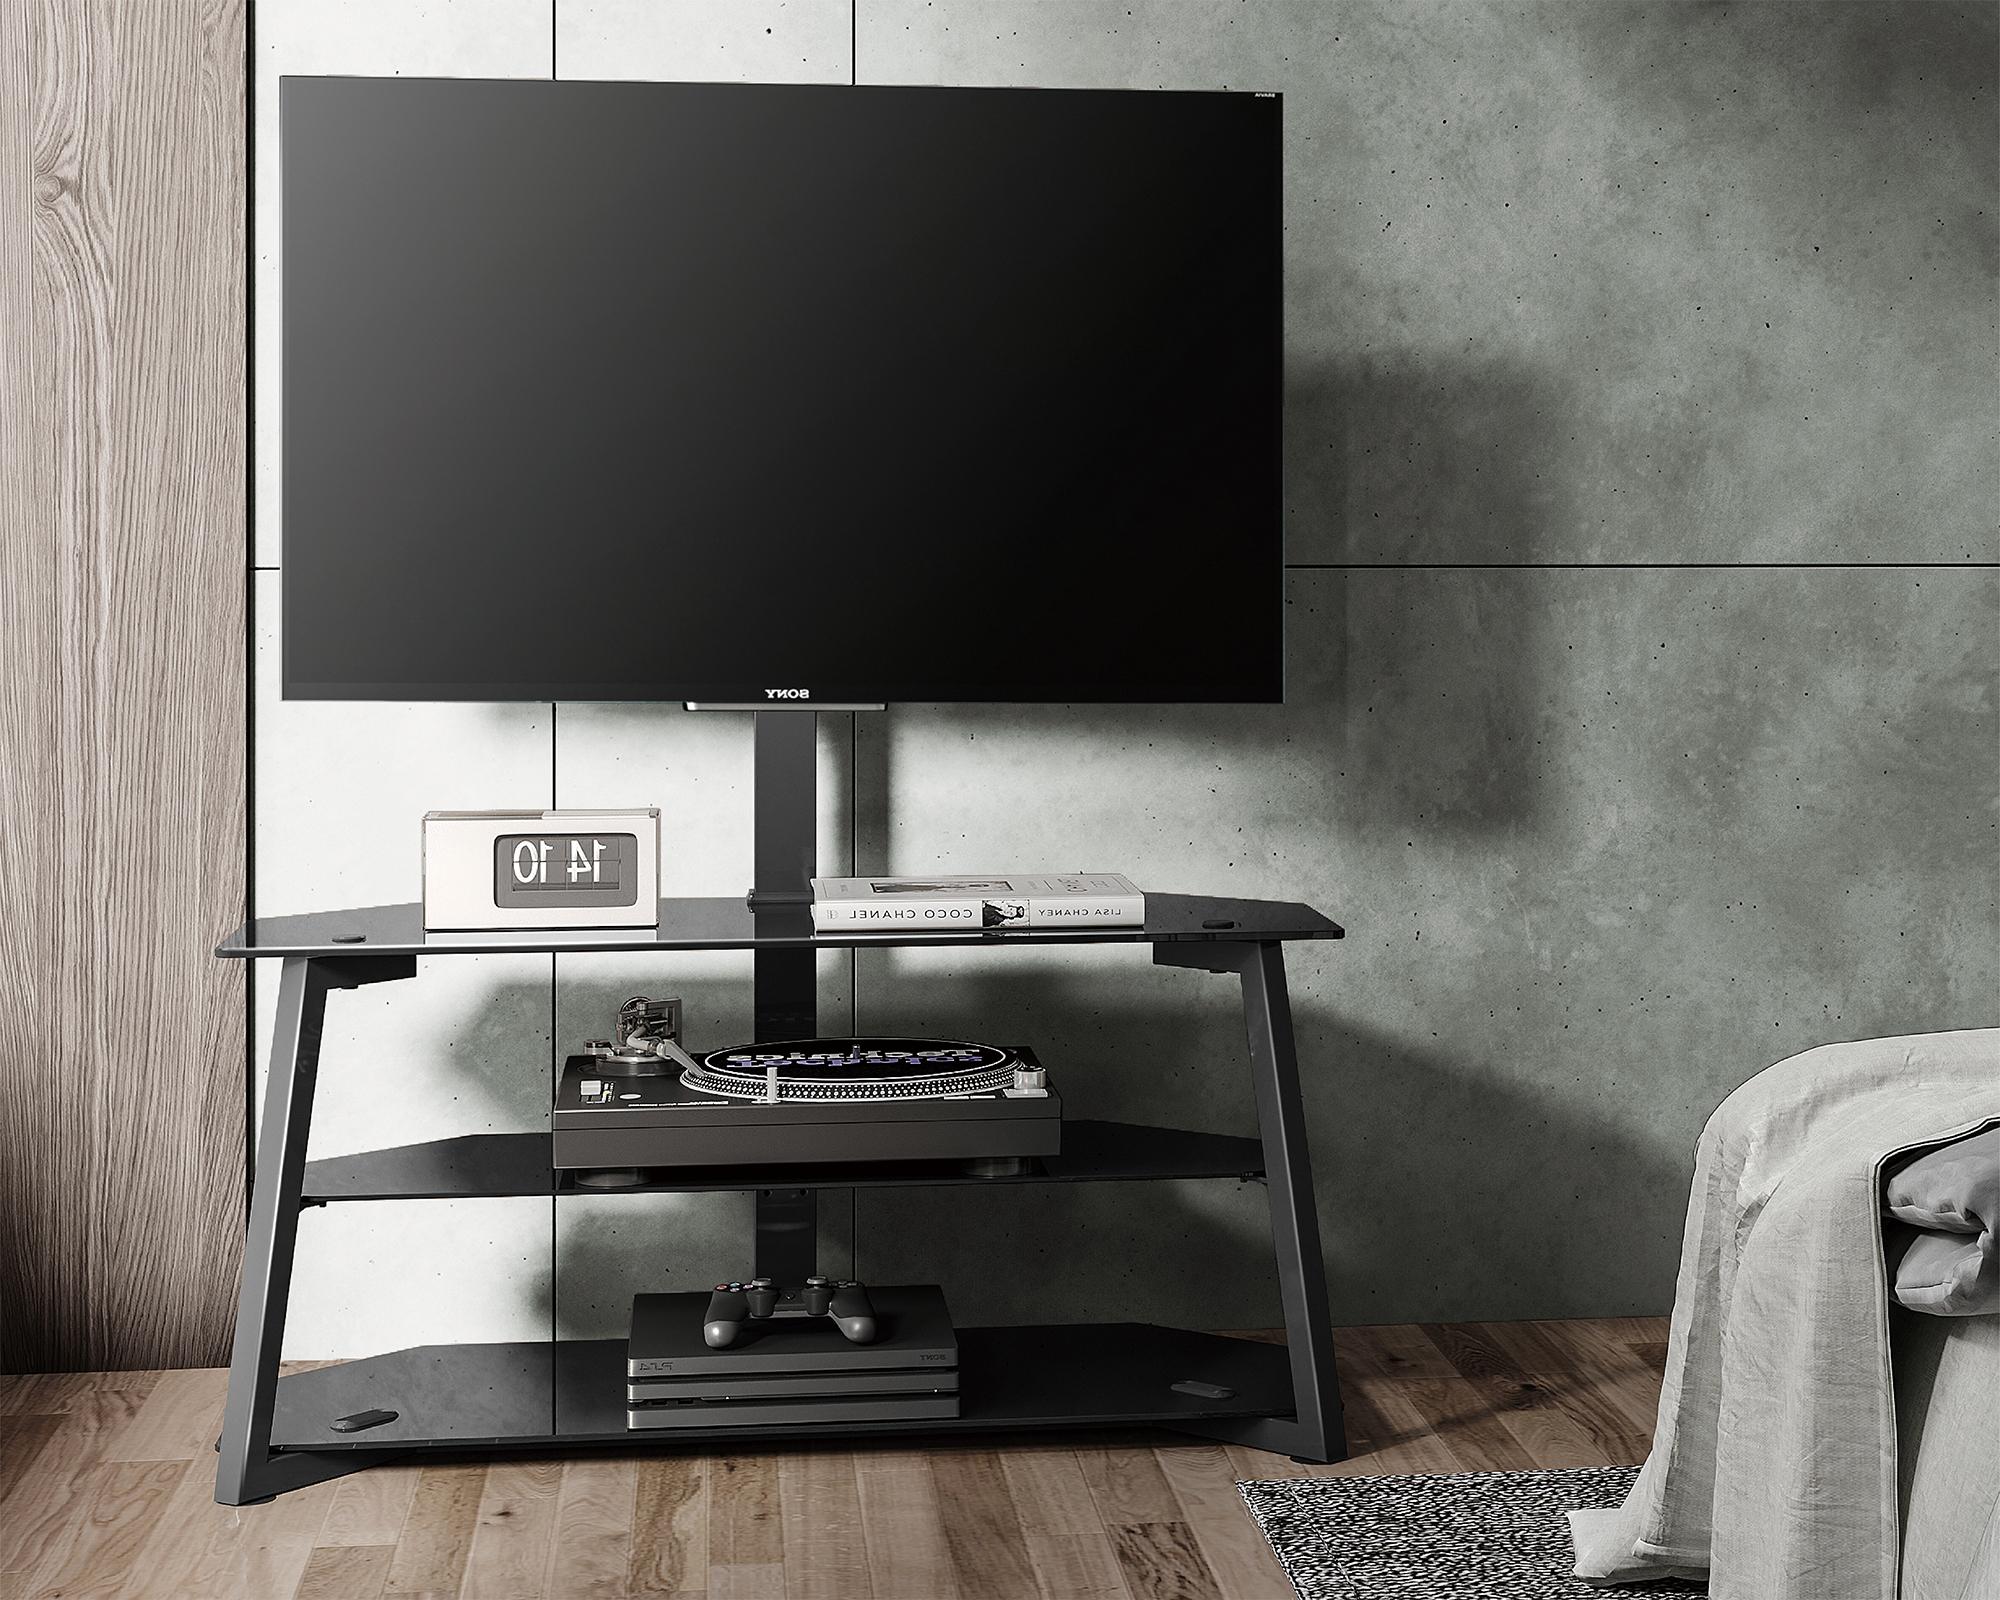 Universal Tv Stand With Mount For Modern Floor Corner Regarding Rfiver Modern Black Floor Tv Stands (View 13 of 20)